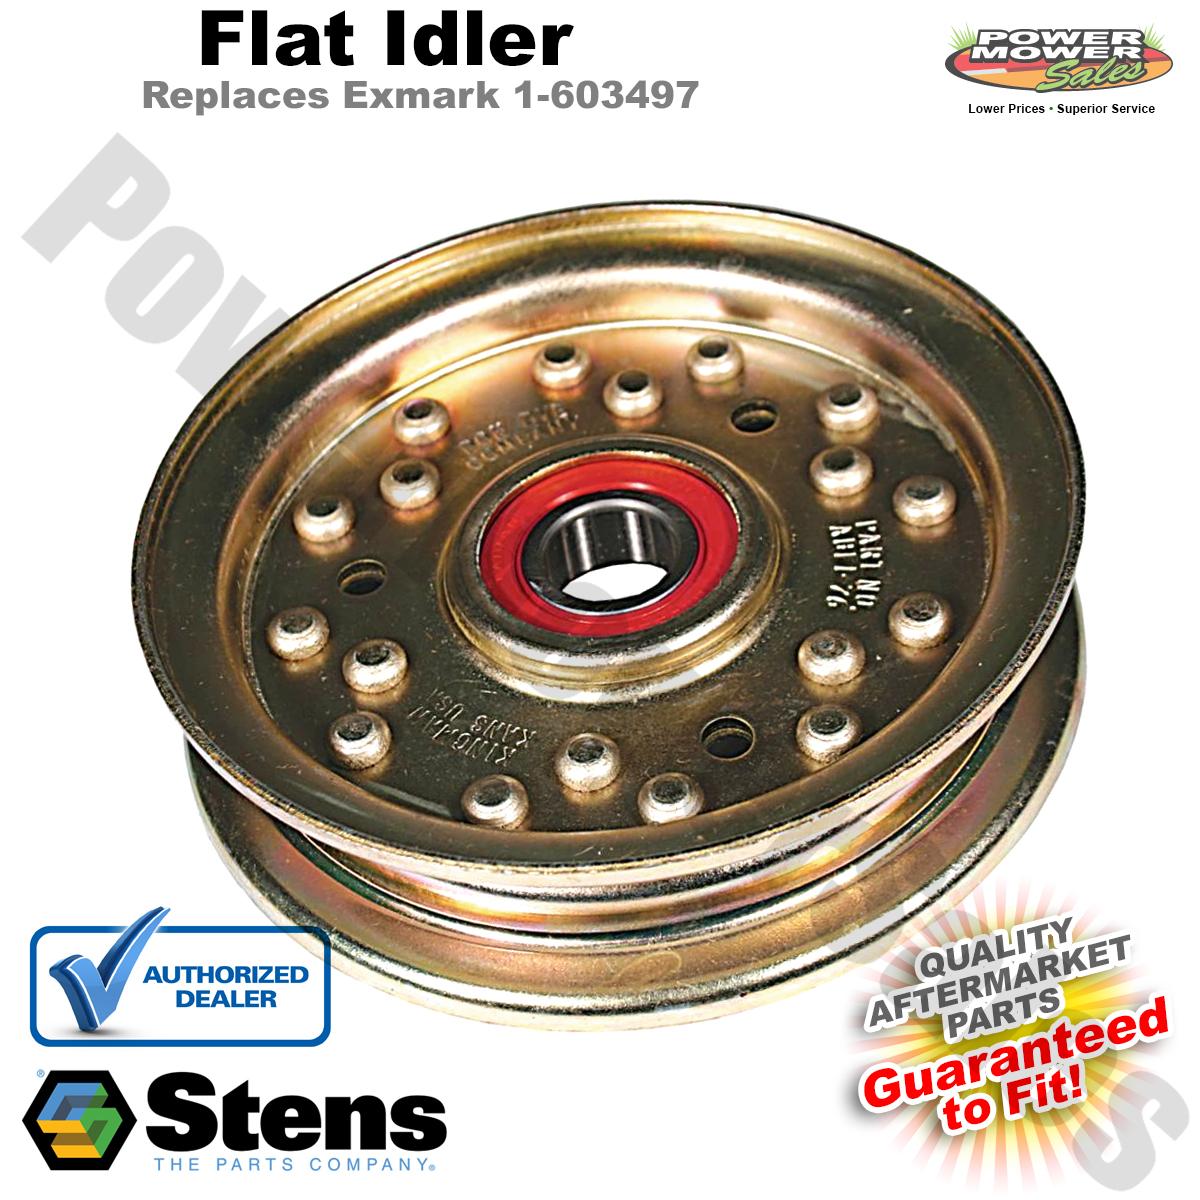 Fits Exmark 1-603497 280-882 Flat Idler